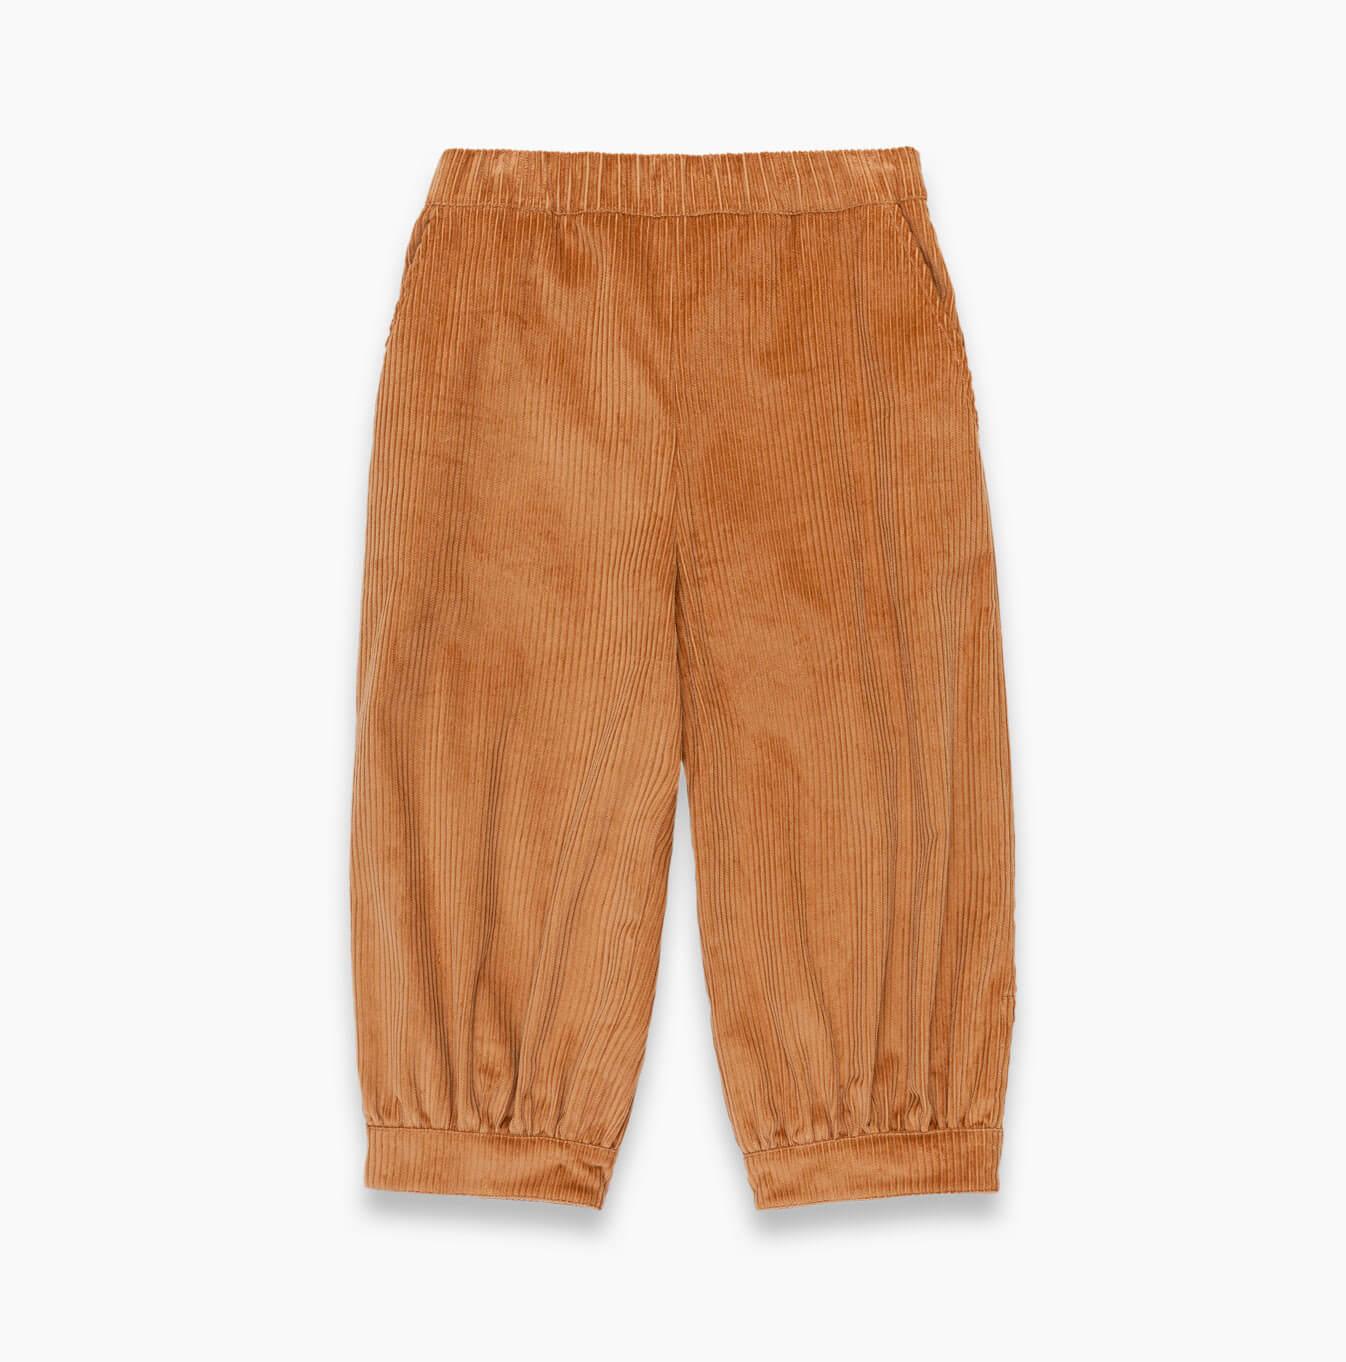 Pantaloni donna velluto | Maffei12 Milano